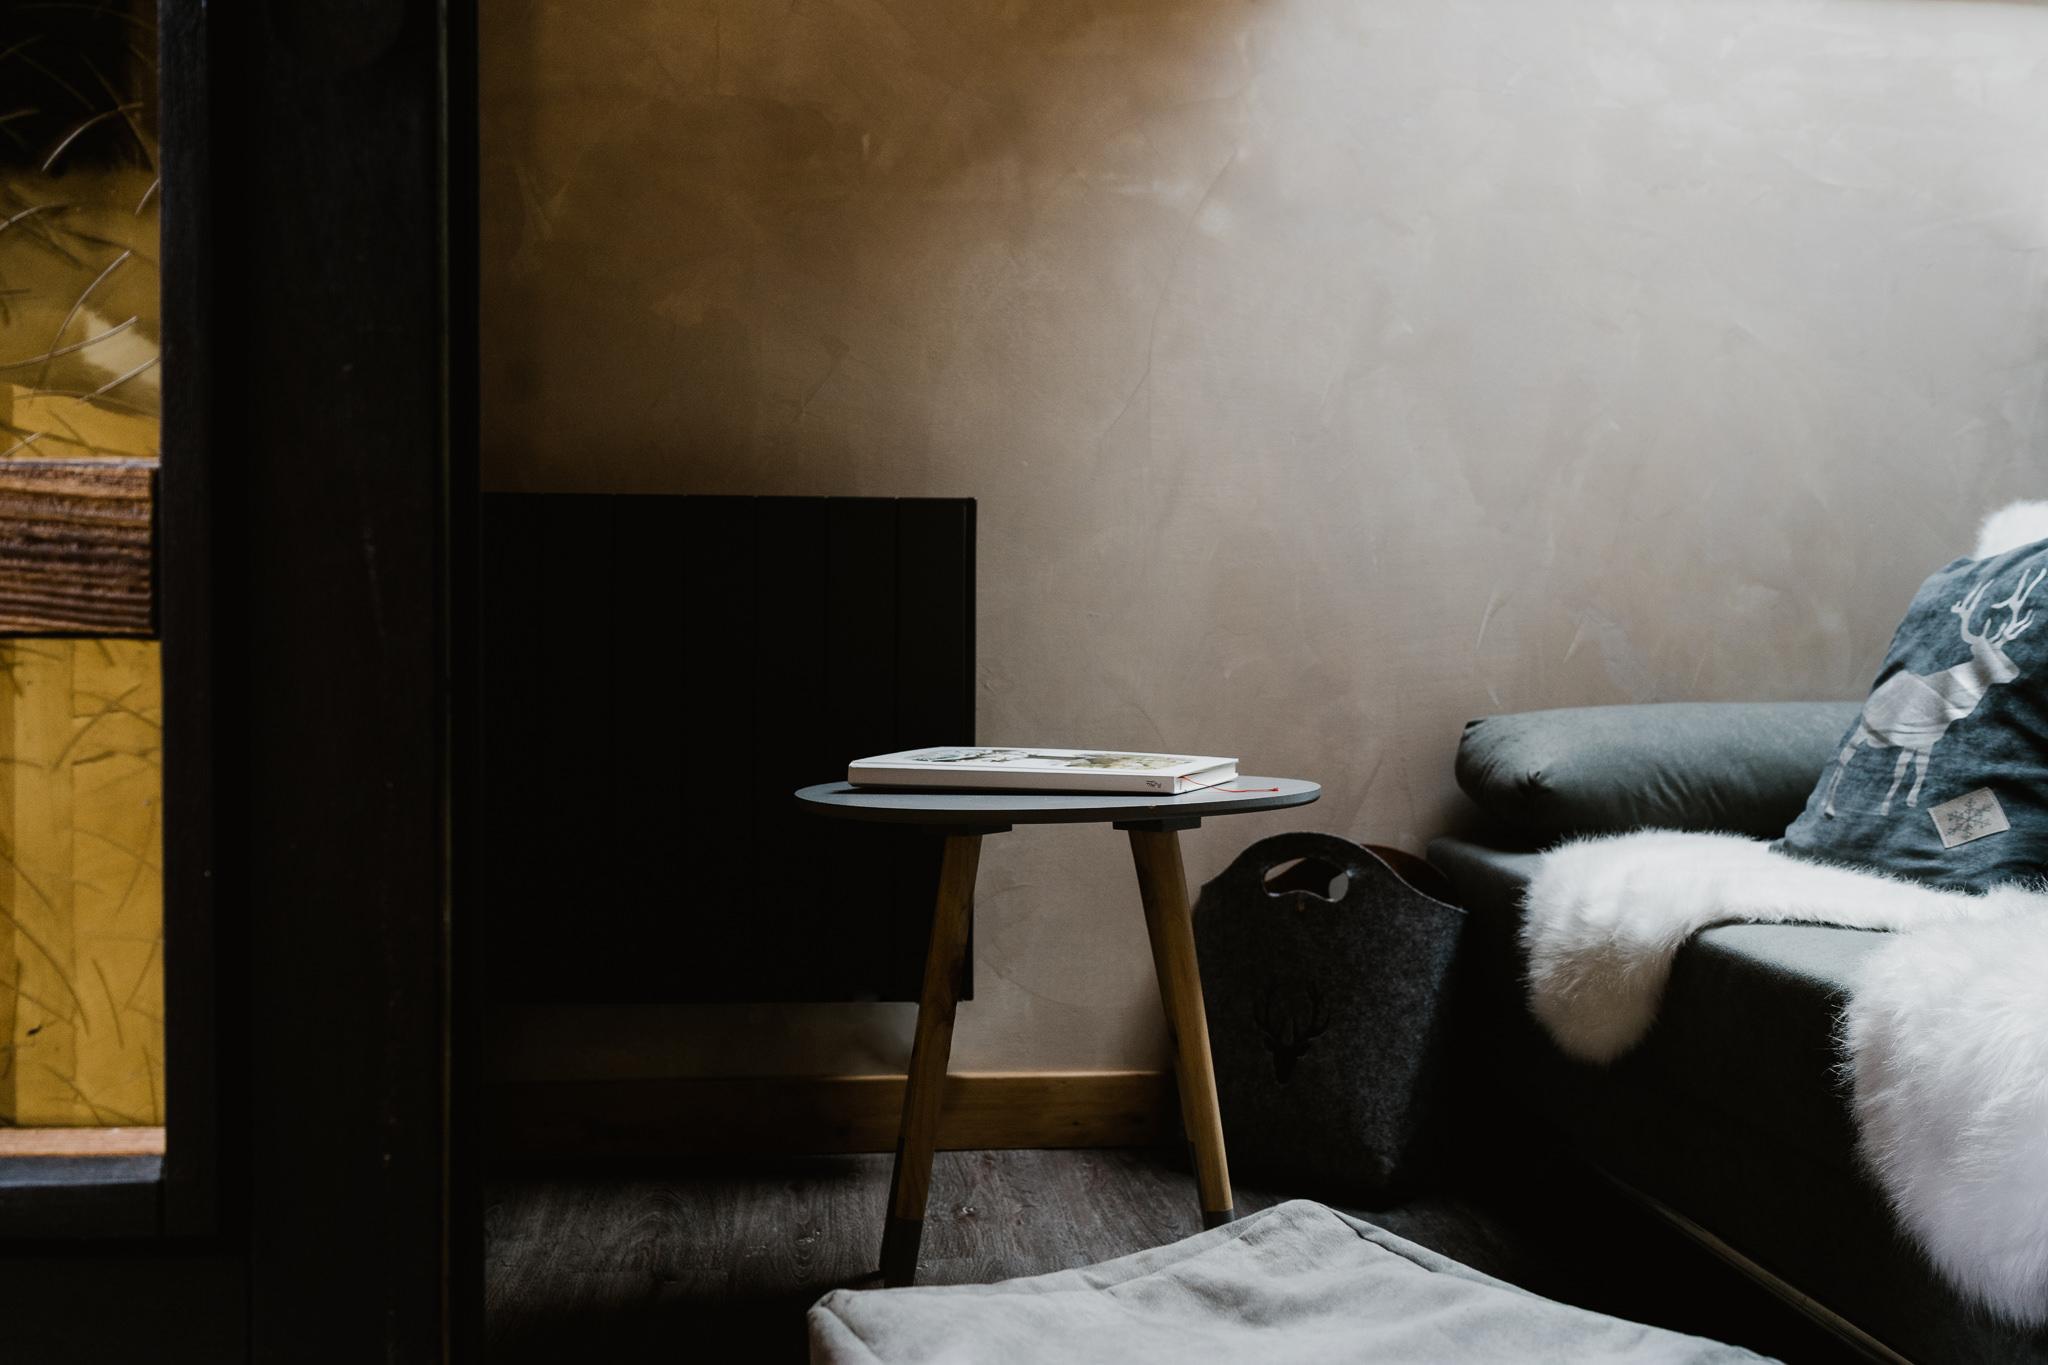 20170511-Chamonix-Airbnb-home-decor-living-room.jpg